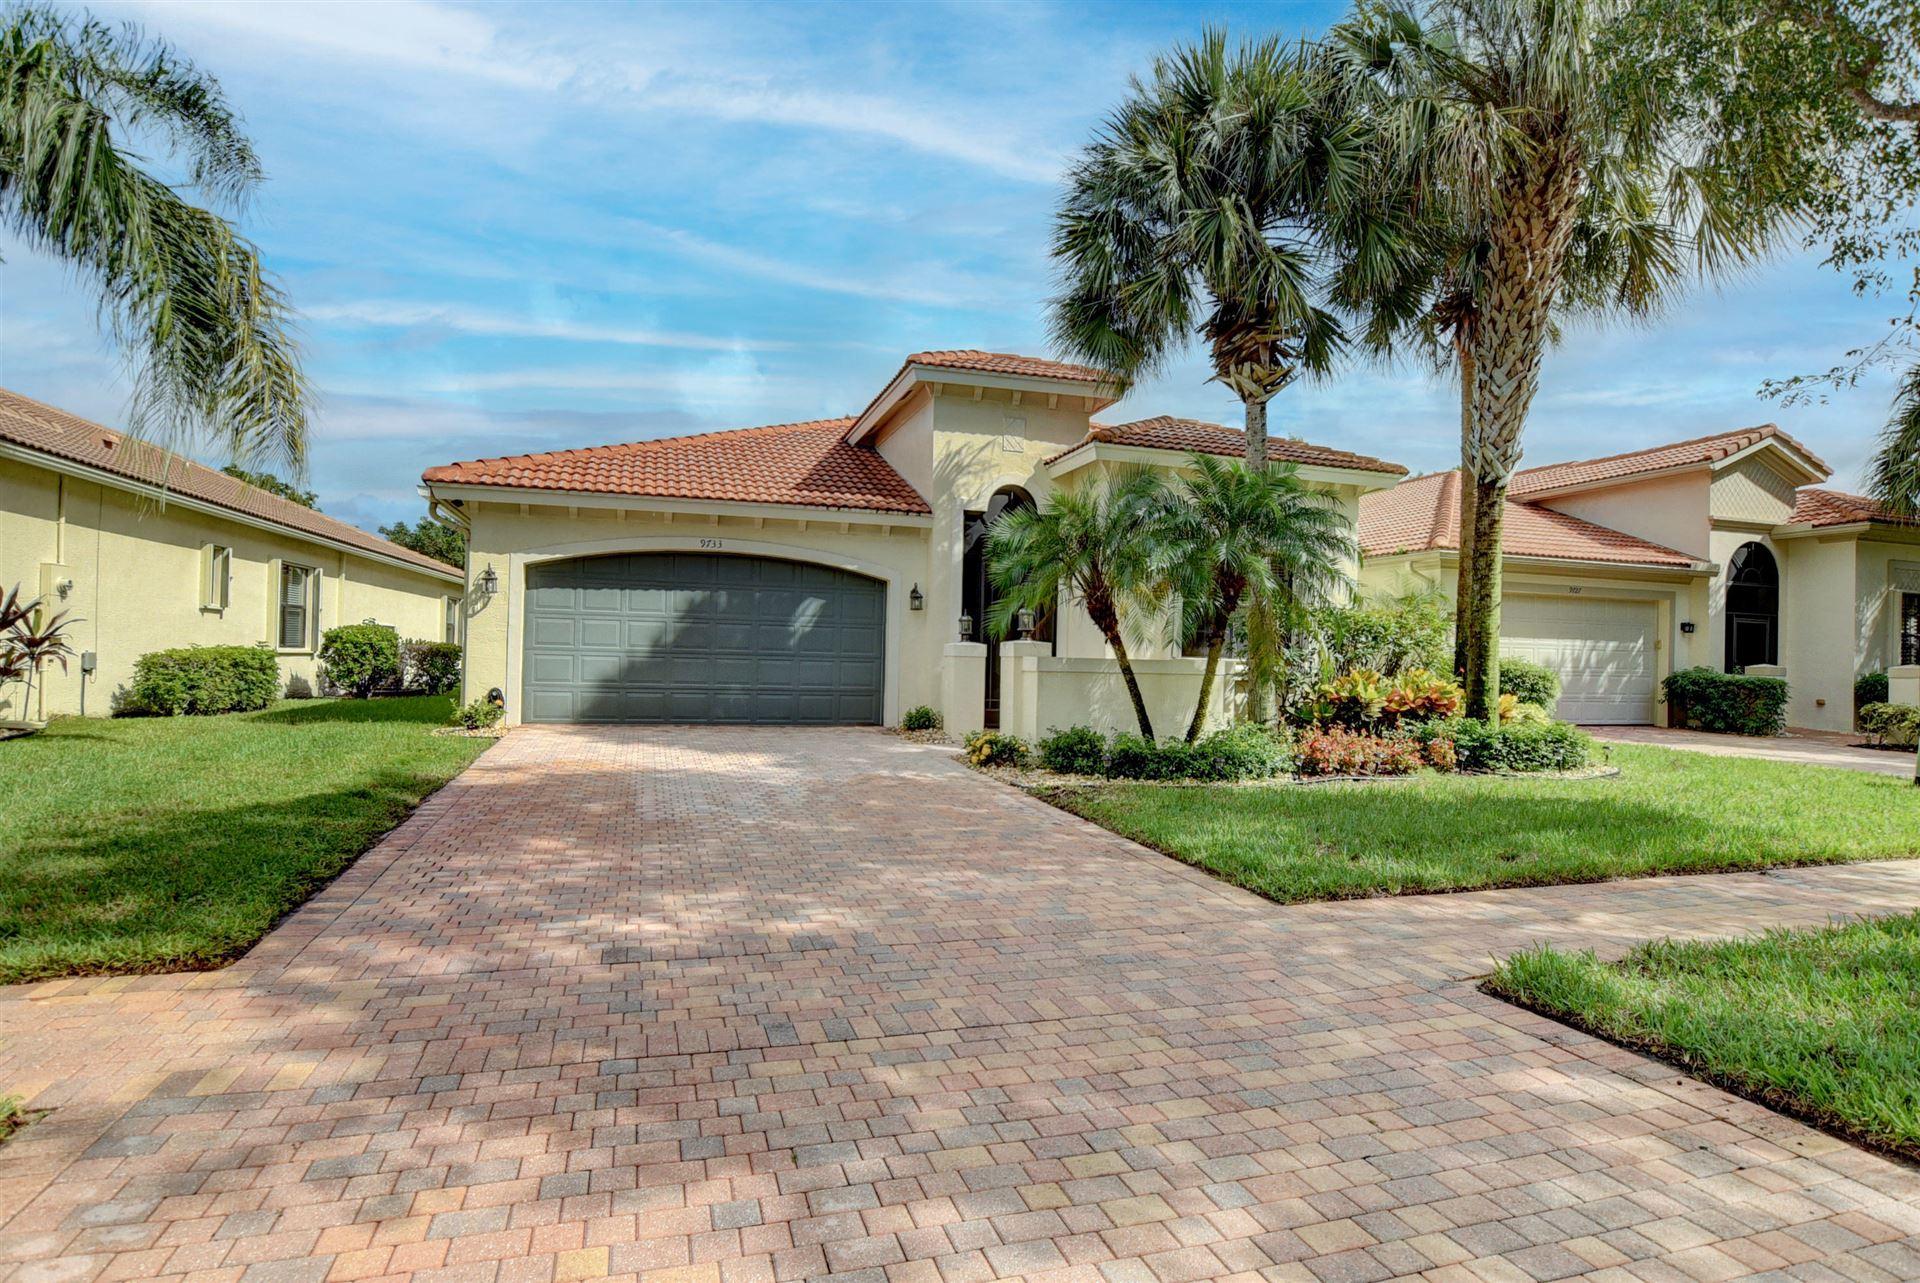 Photo of 9733 Isles Cay Drive, Delray Beach, FL 33446 (MLS # RX-10665817)